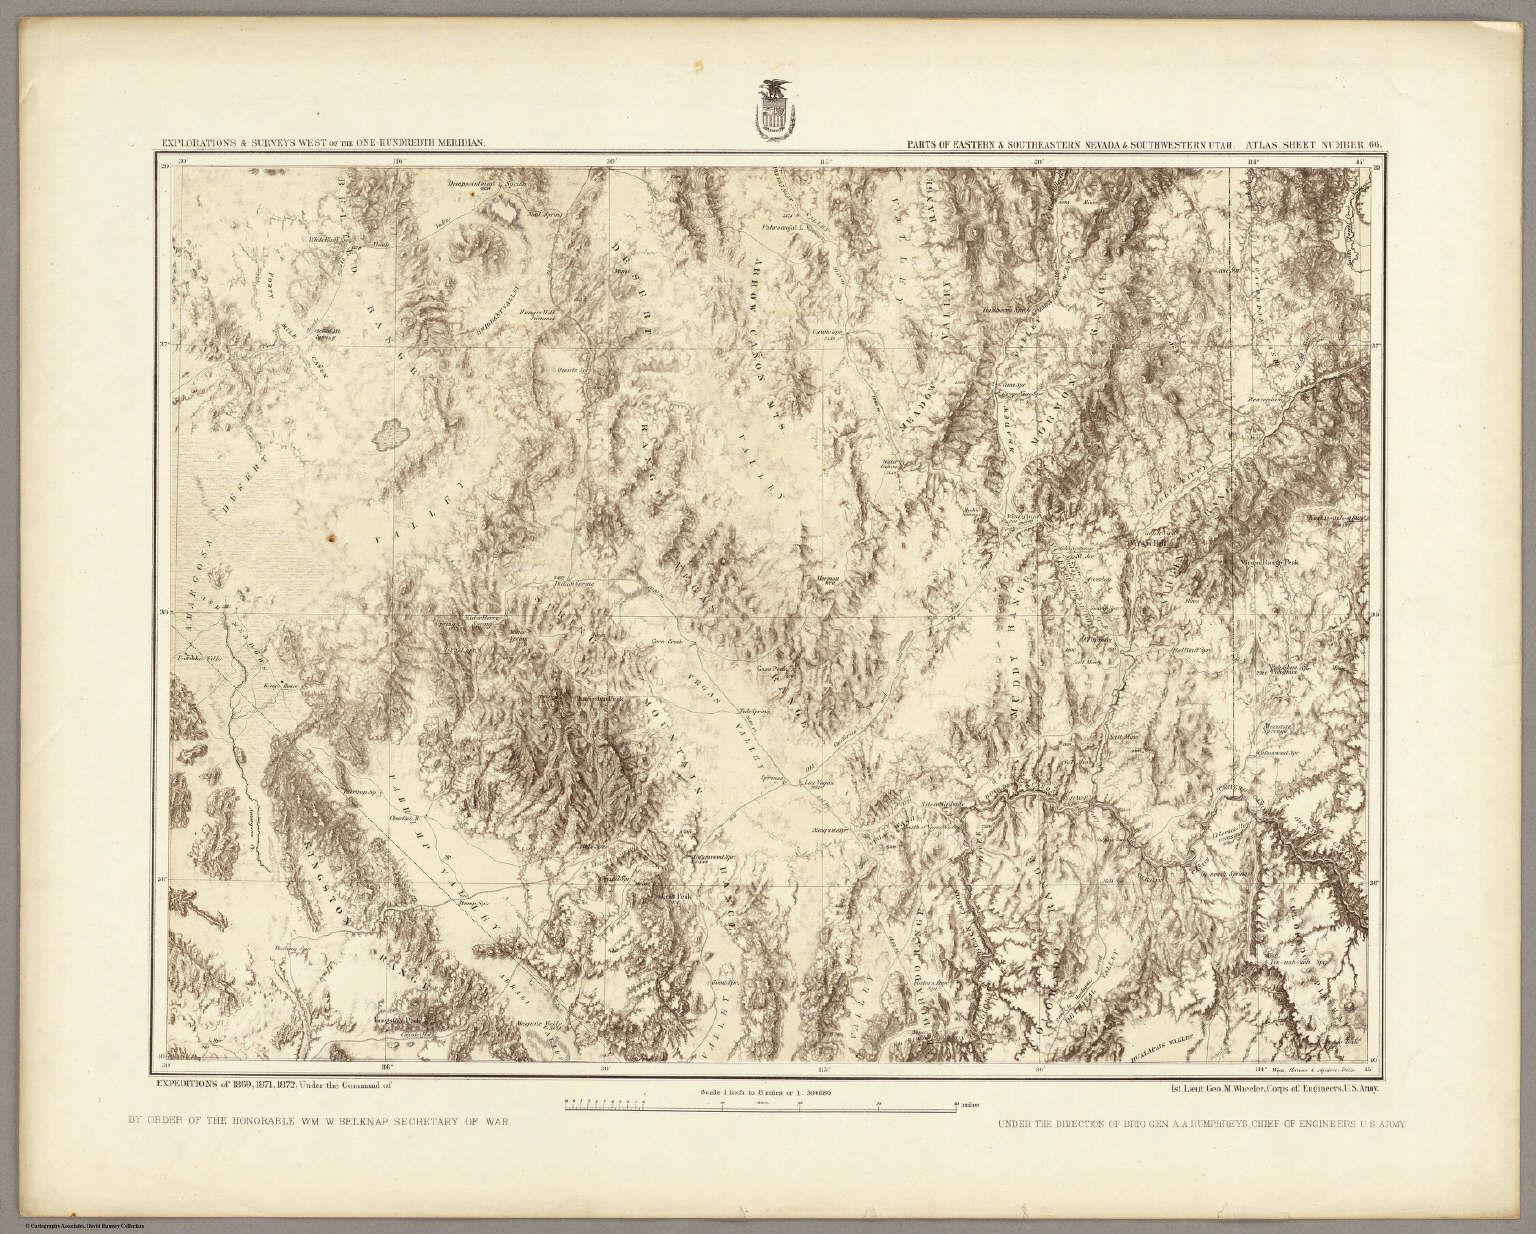 66. Parts Of Eastern & Southeastern Nevada & Southwestern Utah.